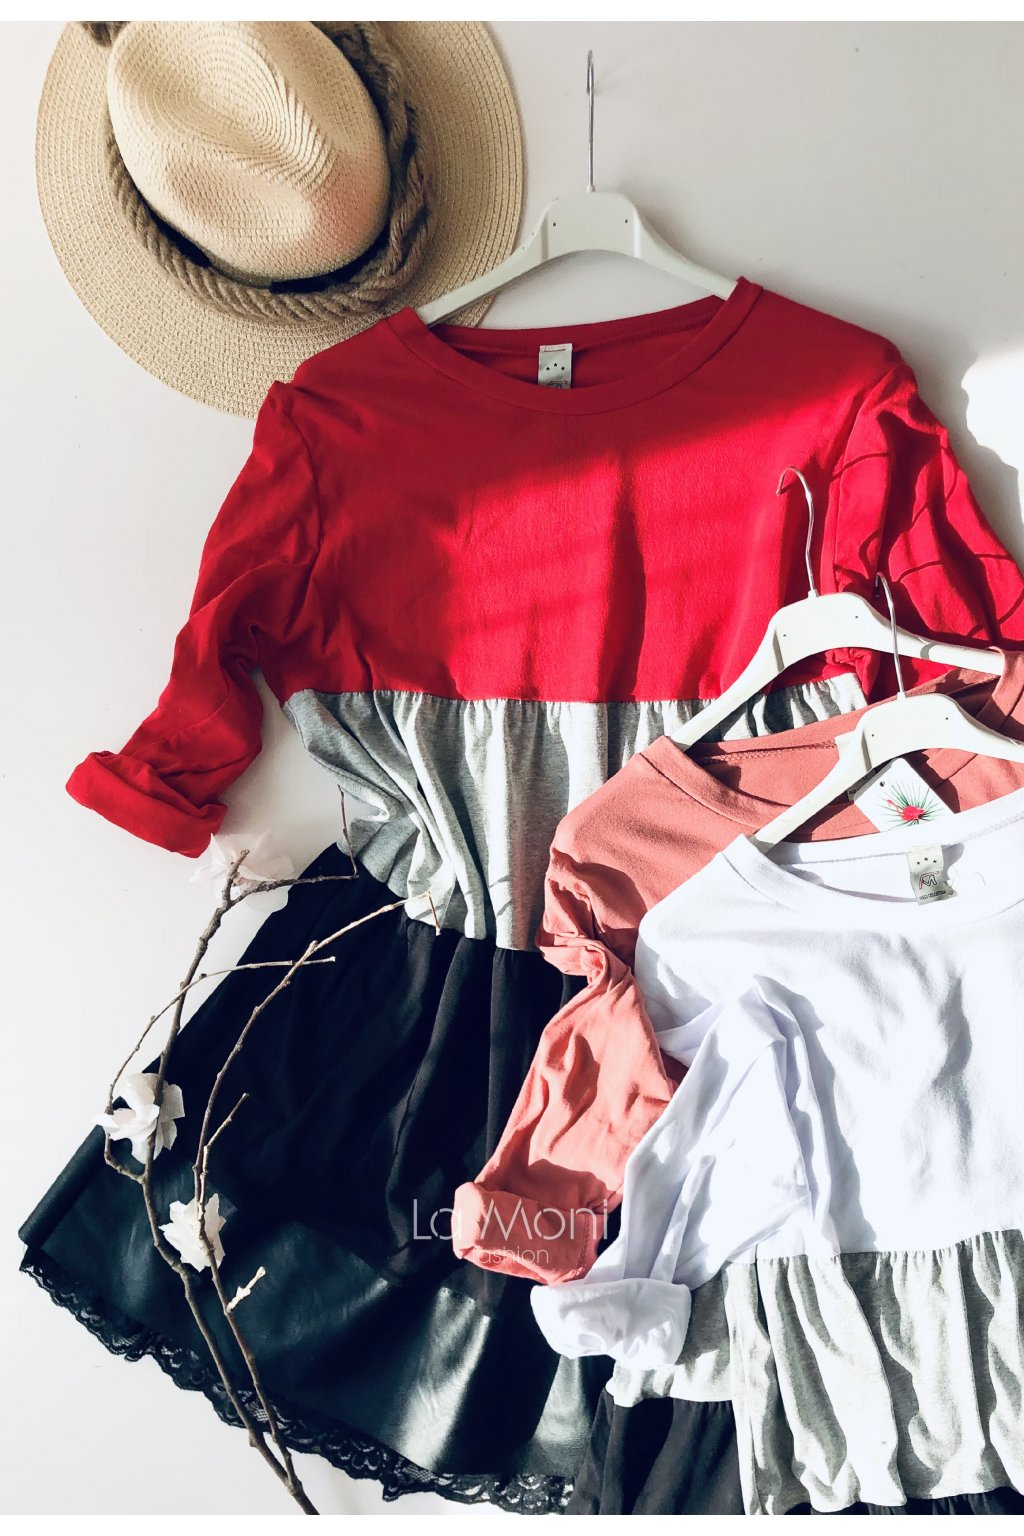 Šaty trojbarevné s volány